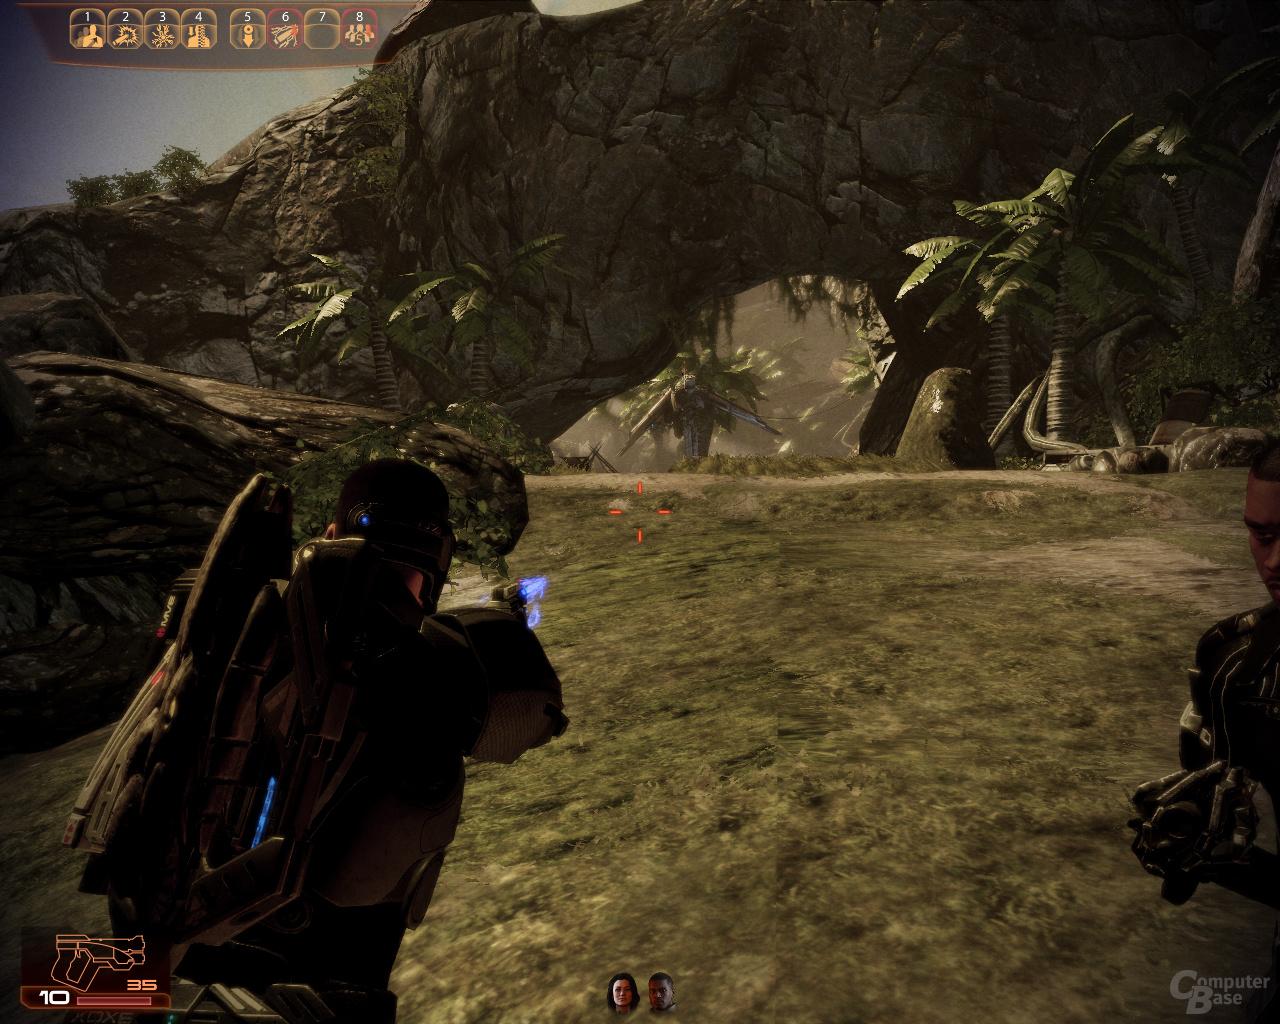 ATi RV870 - Mass Effect 2